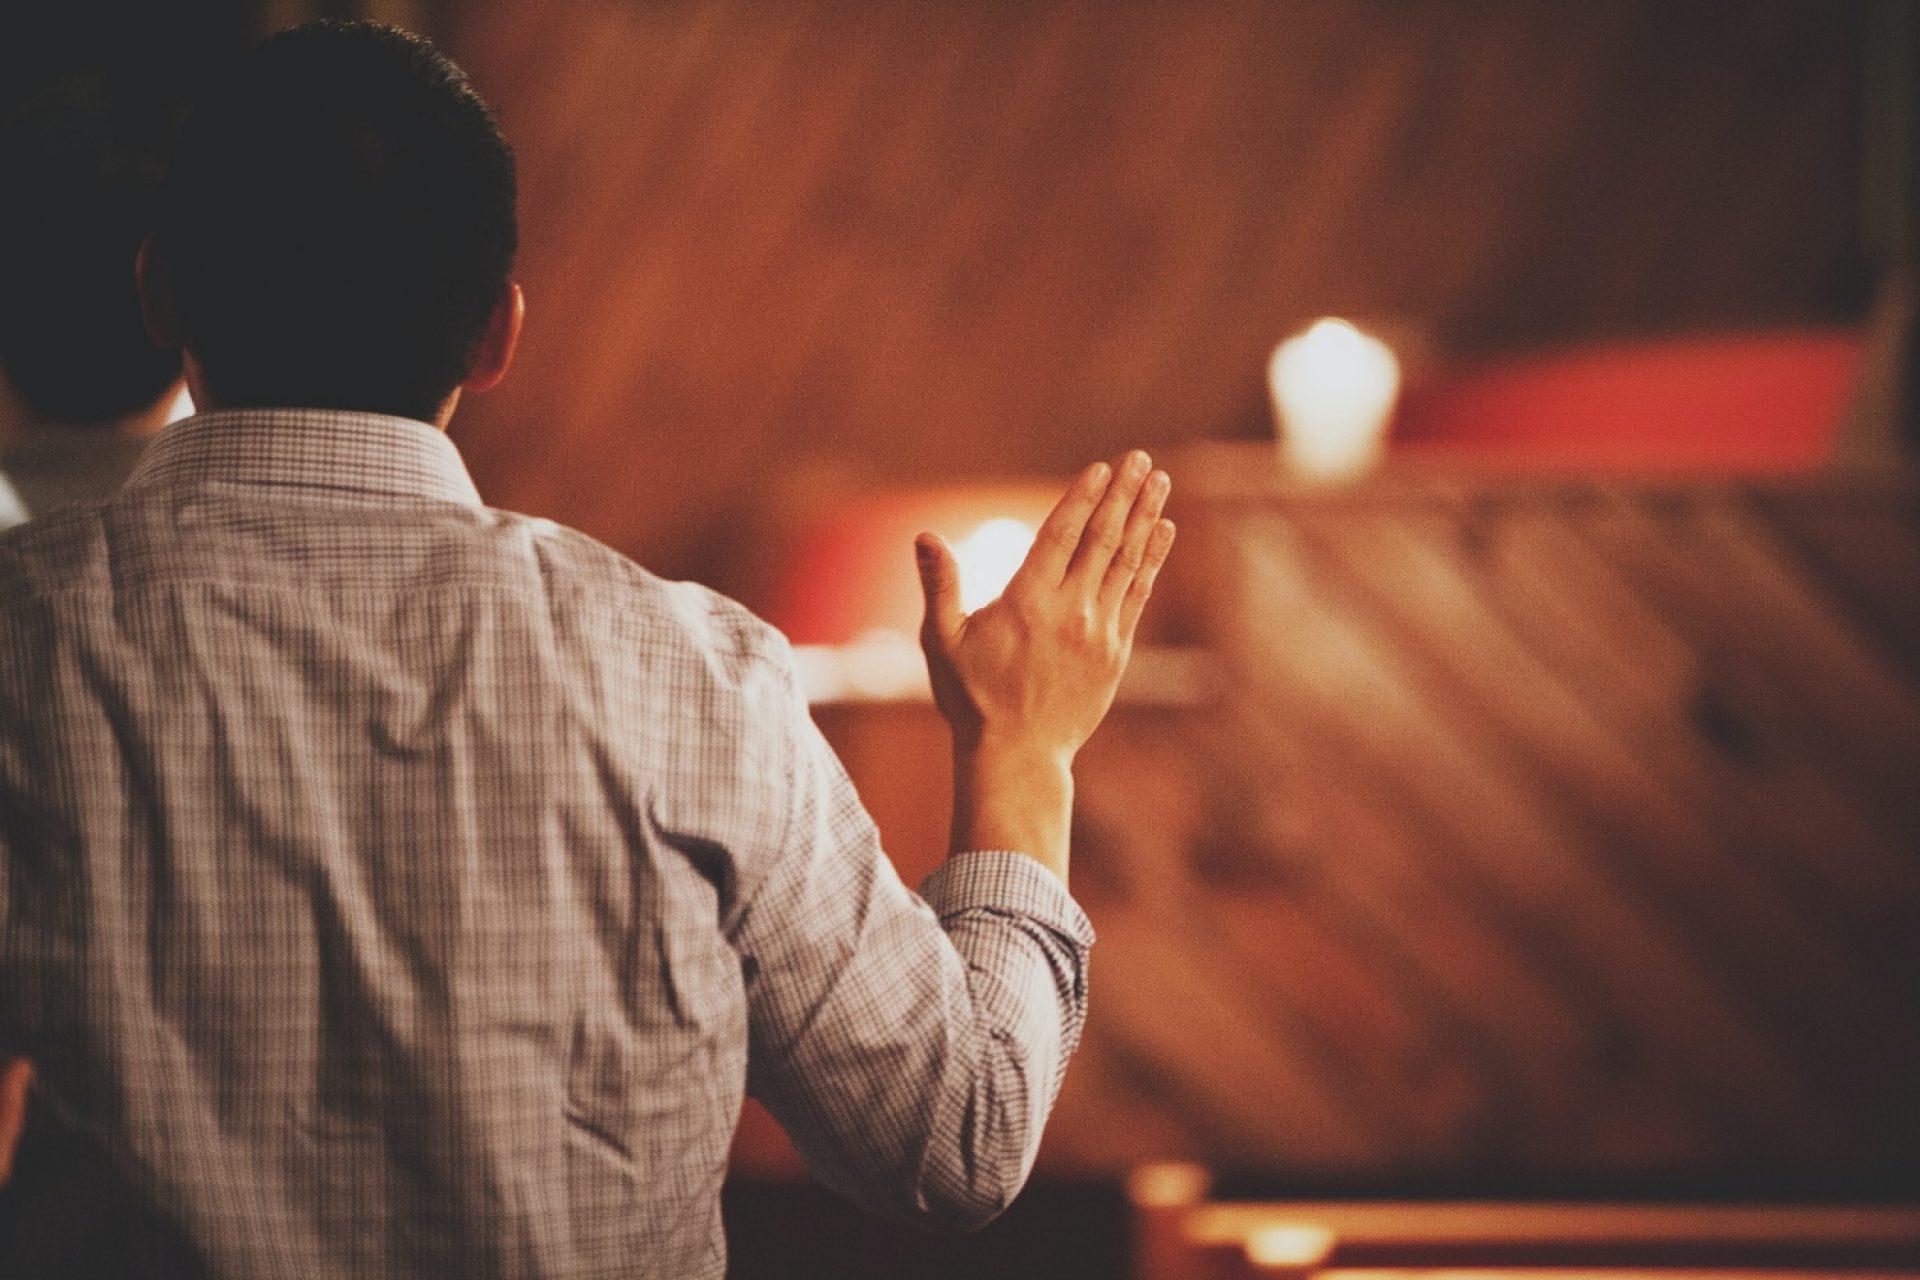 Iglesia Pentecostal Uncion Apostolica